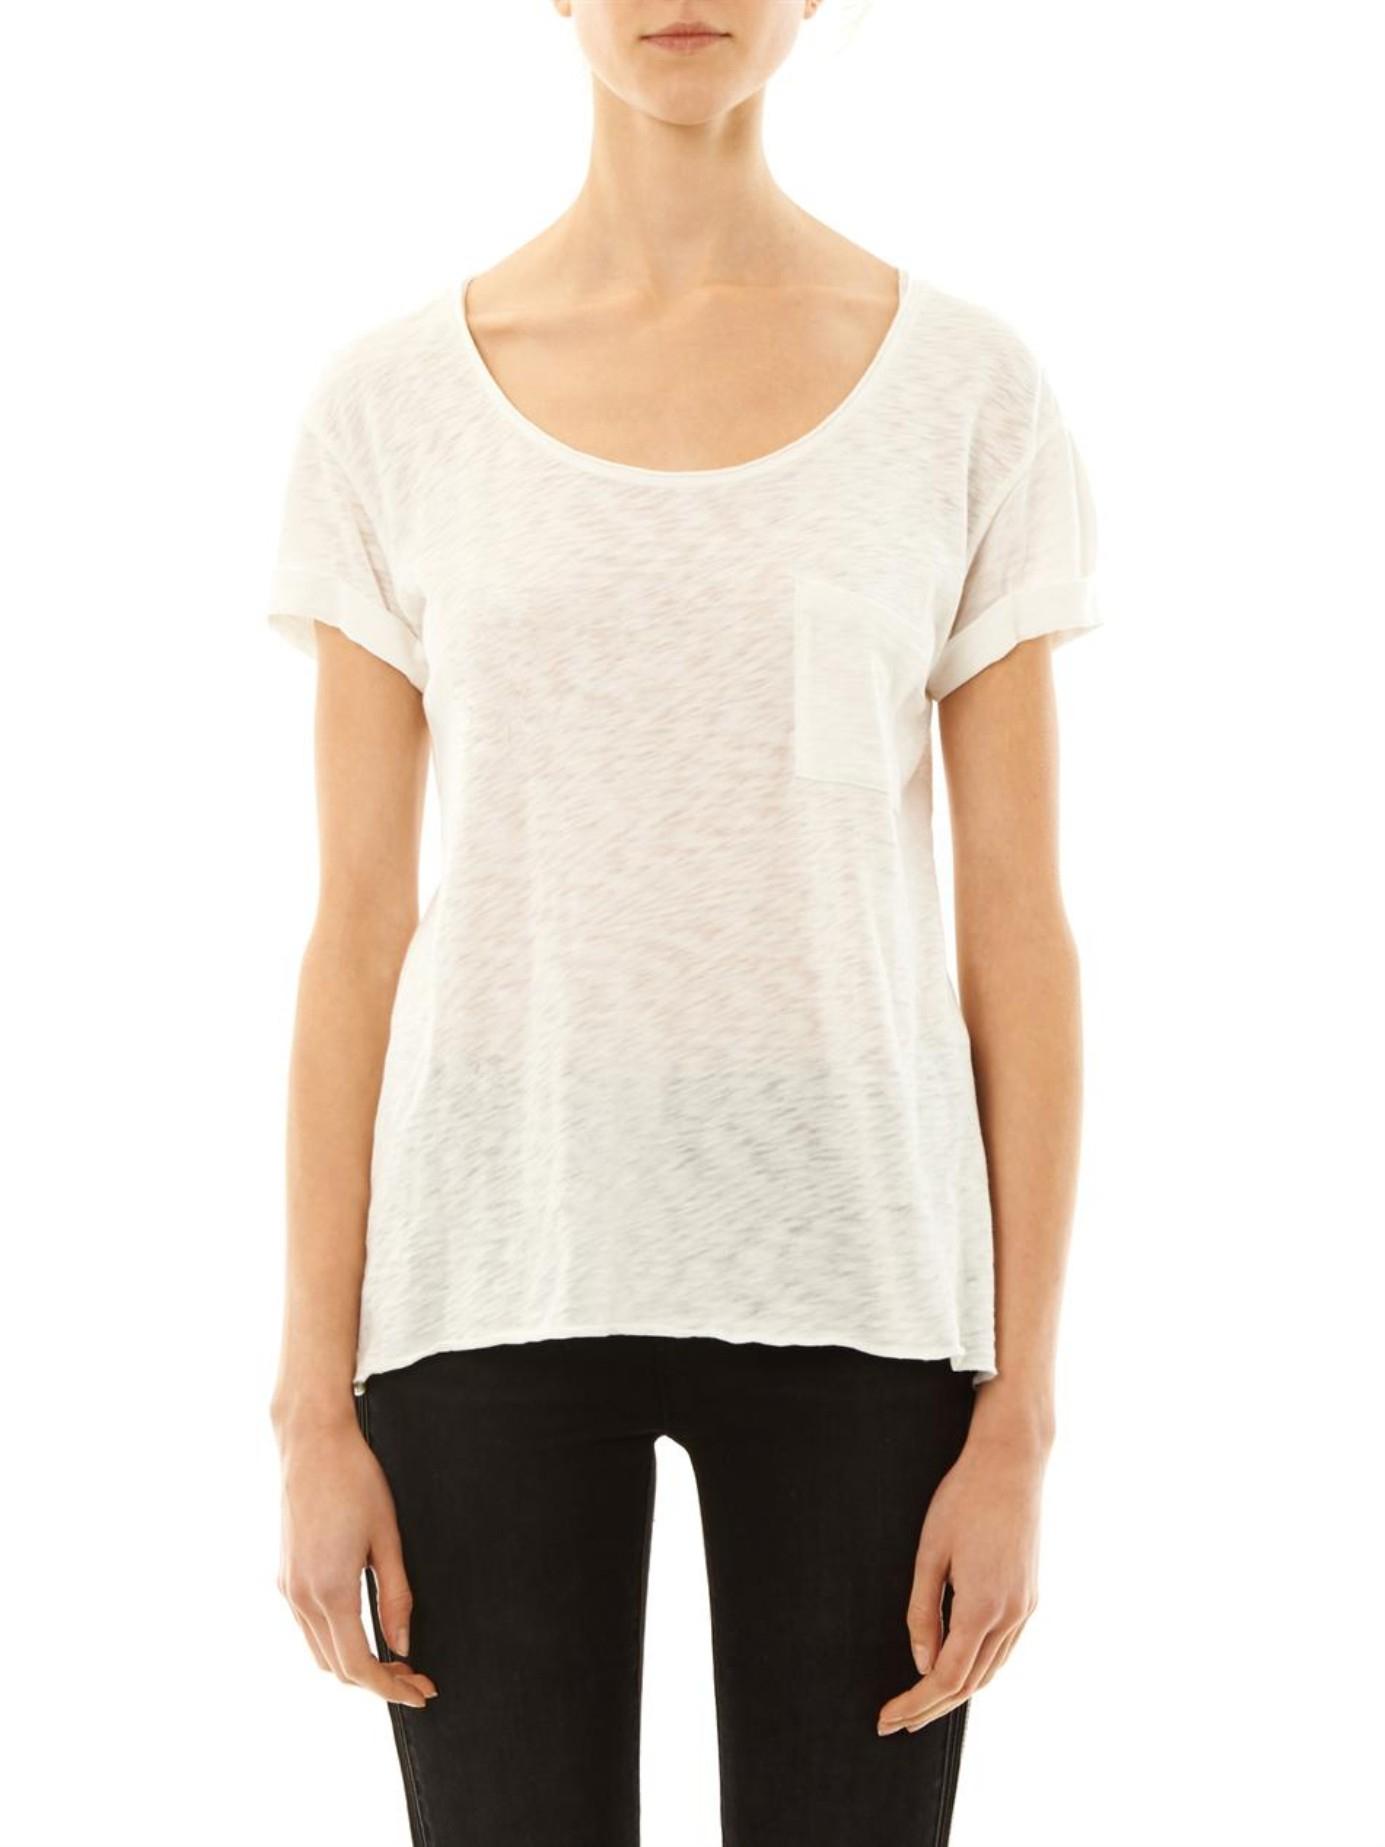 Rag bone the pocket t shirt in white lyst for Rag and bone t shirts